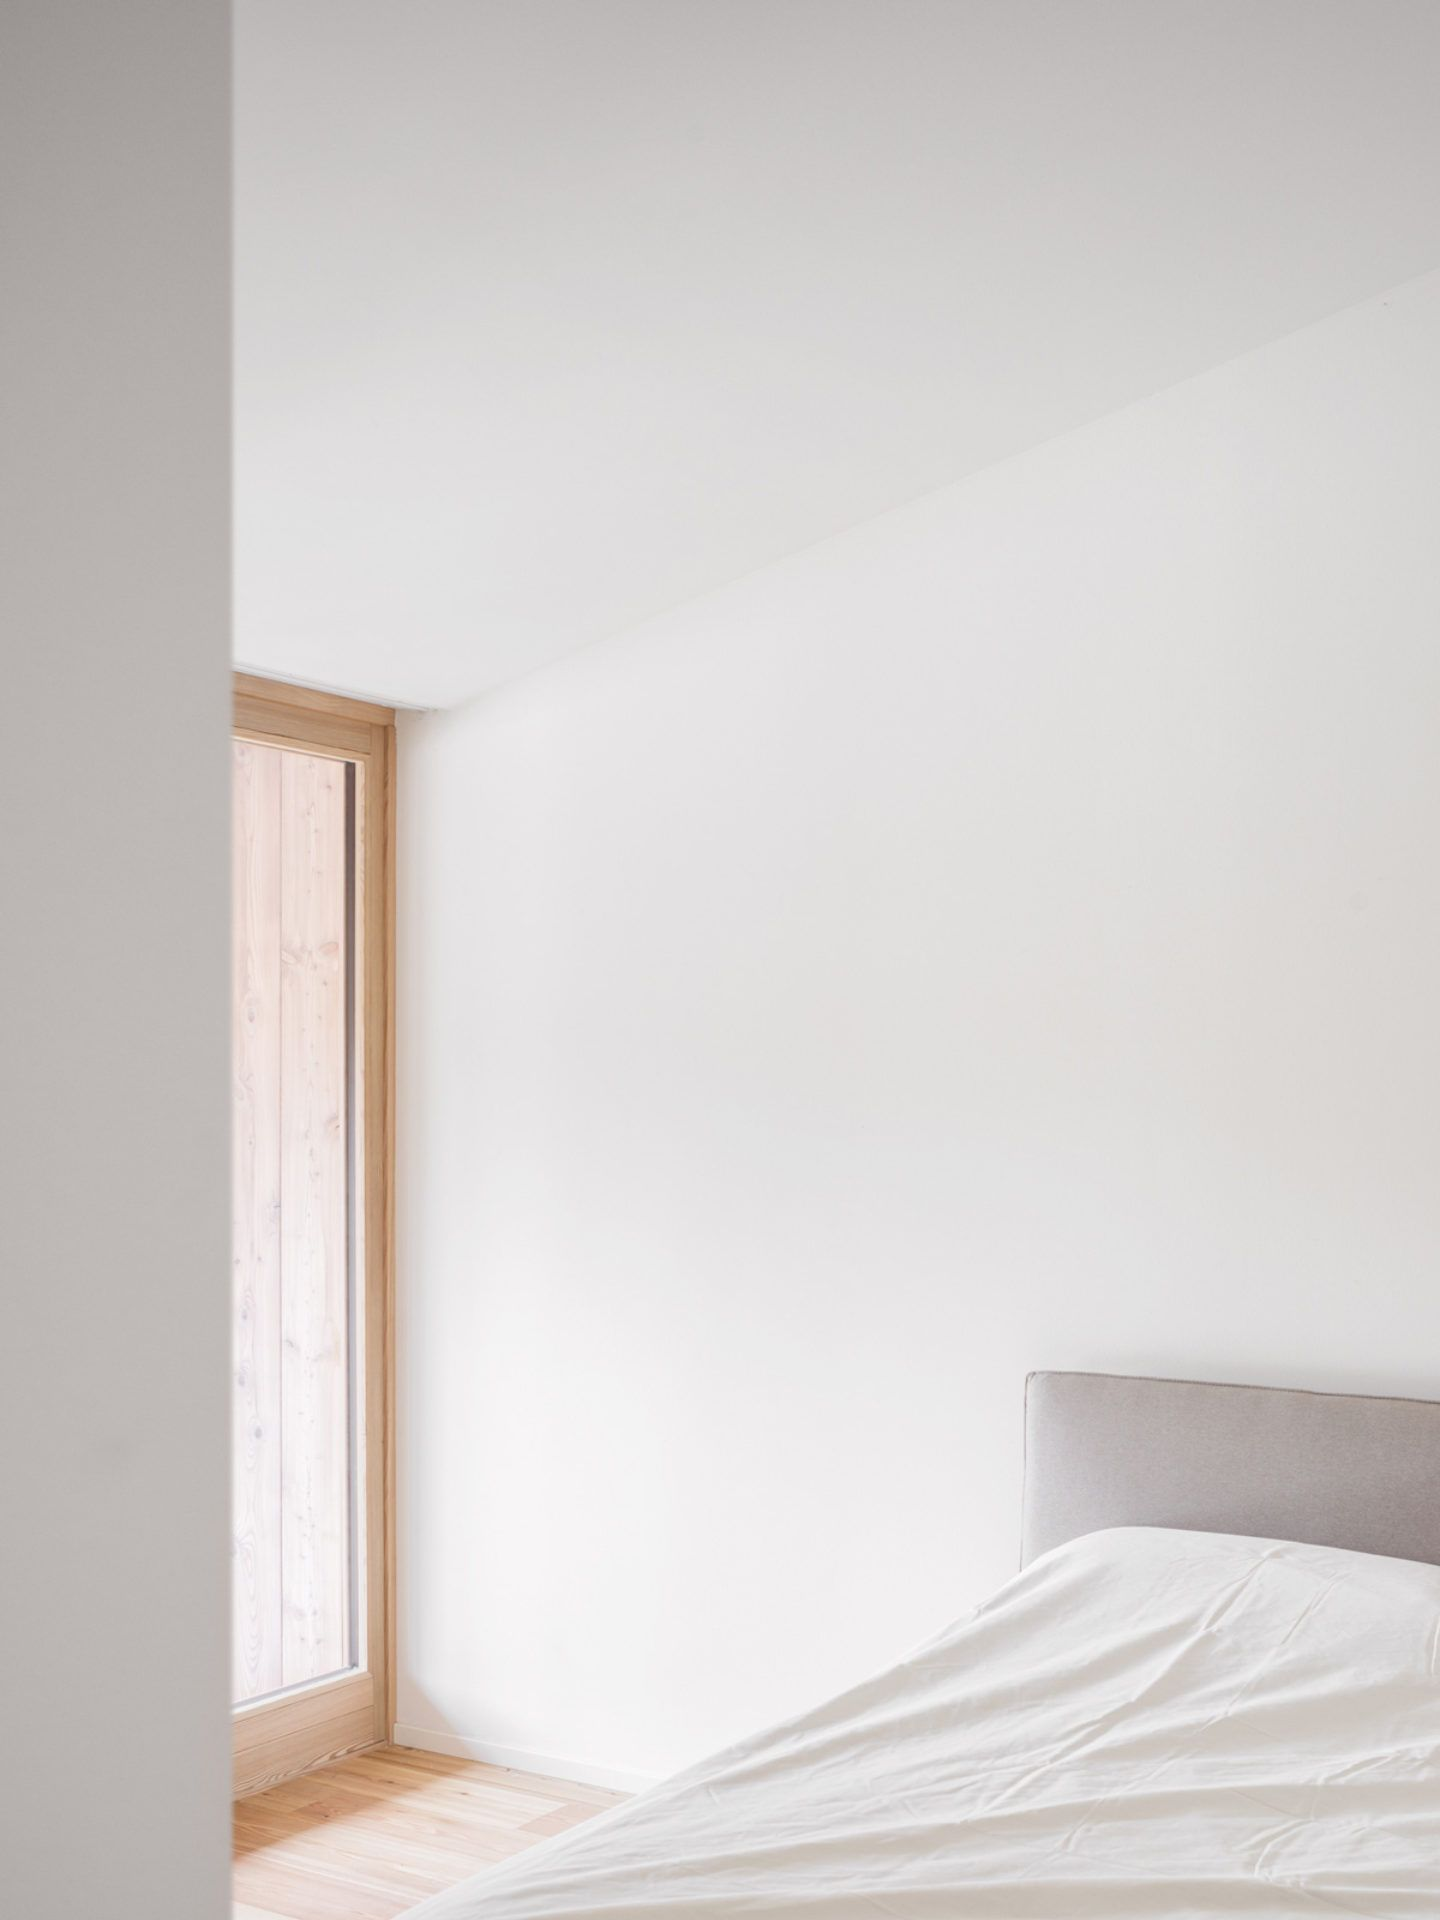 IGNANT-Architecture-Studio-Wok-Country-Home-In-Chievo-20